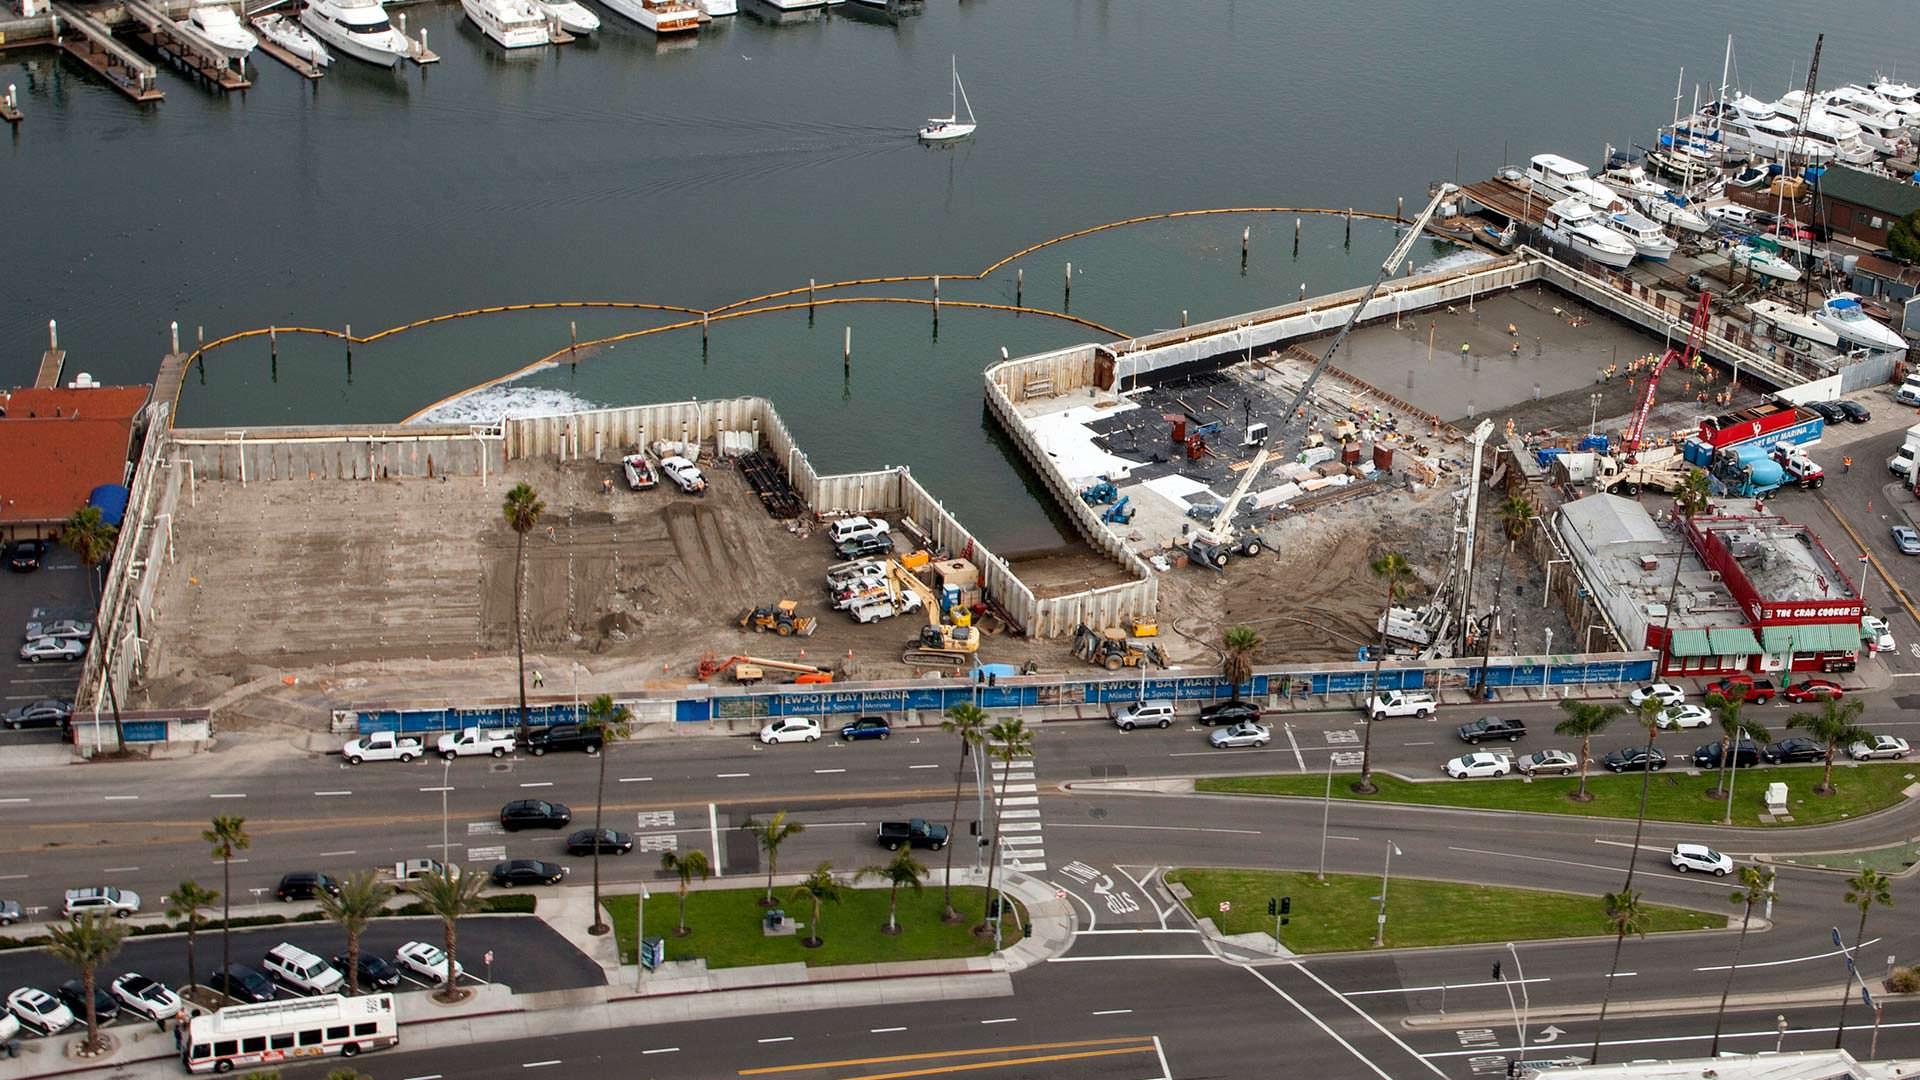 Newport Bay Marina